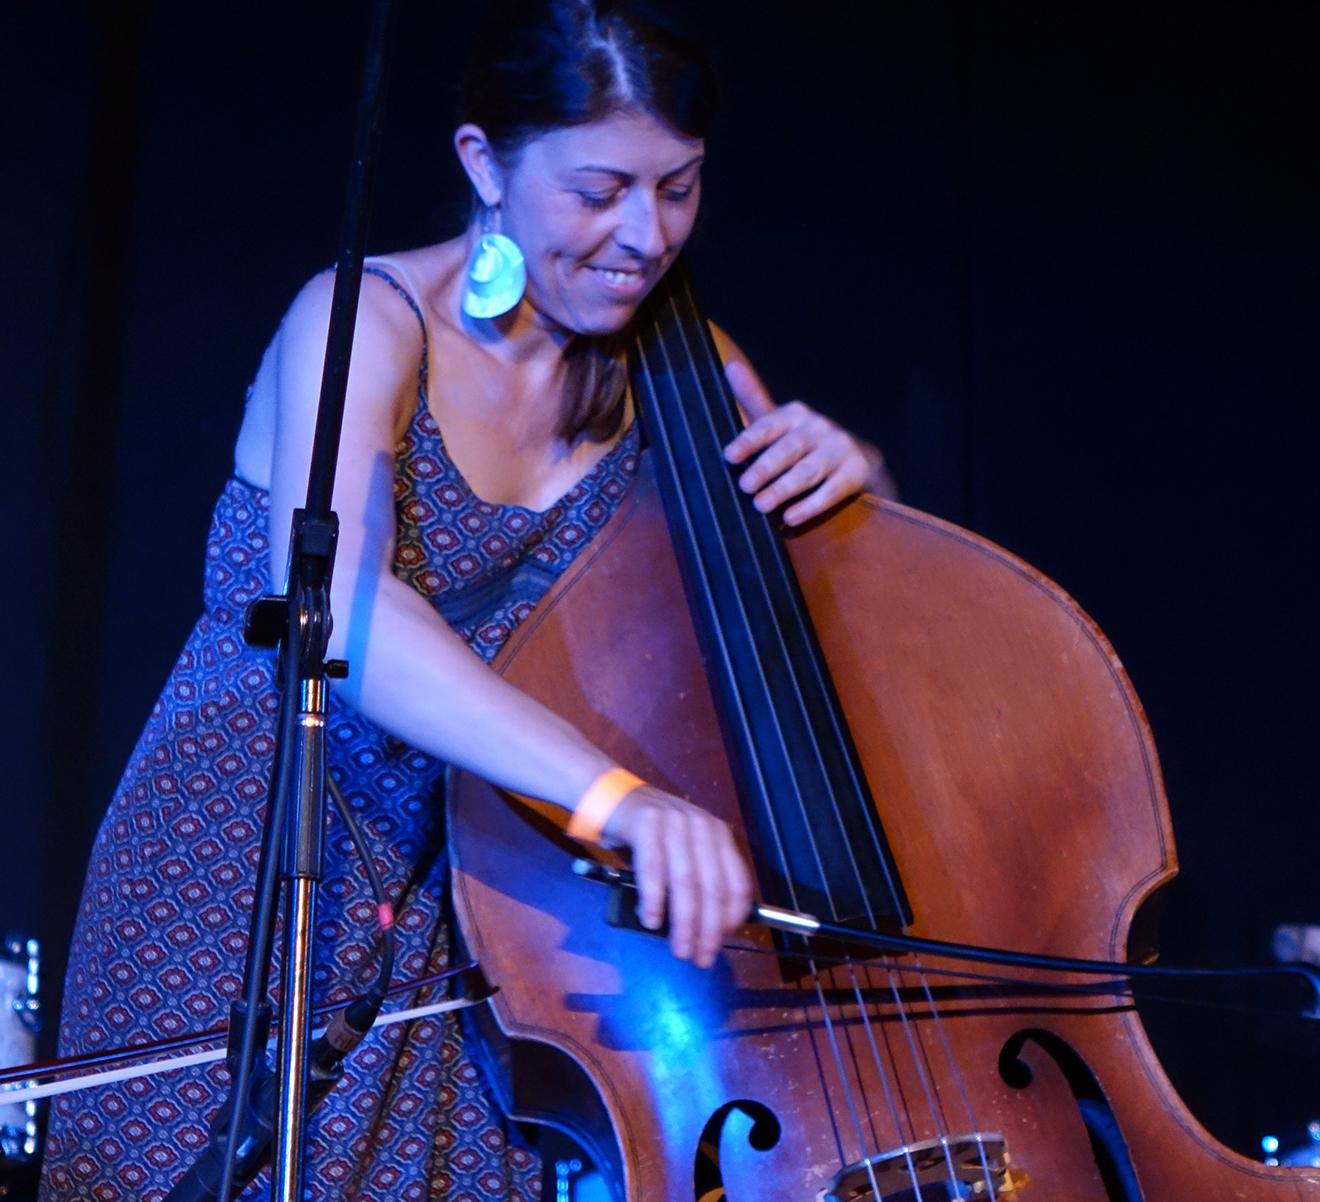 Silvia Bolognesi at Vision Festival 20